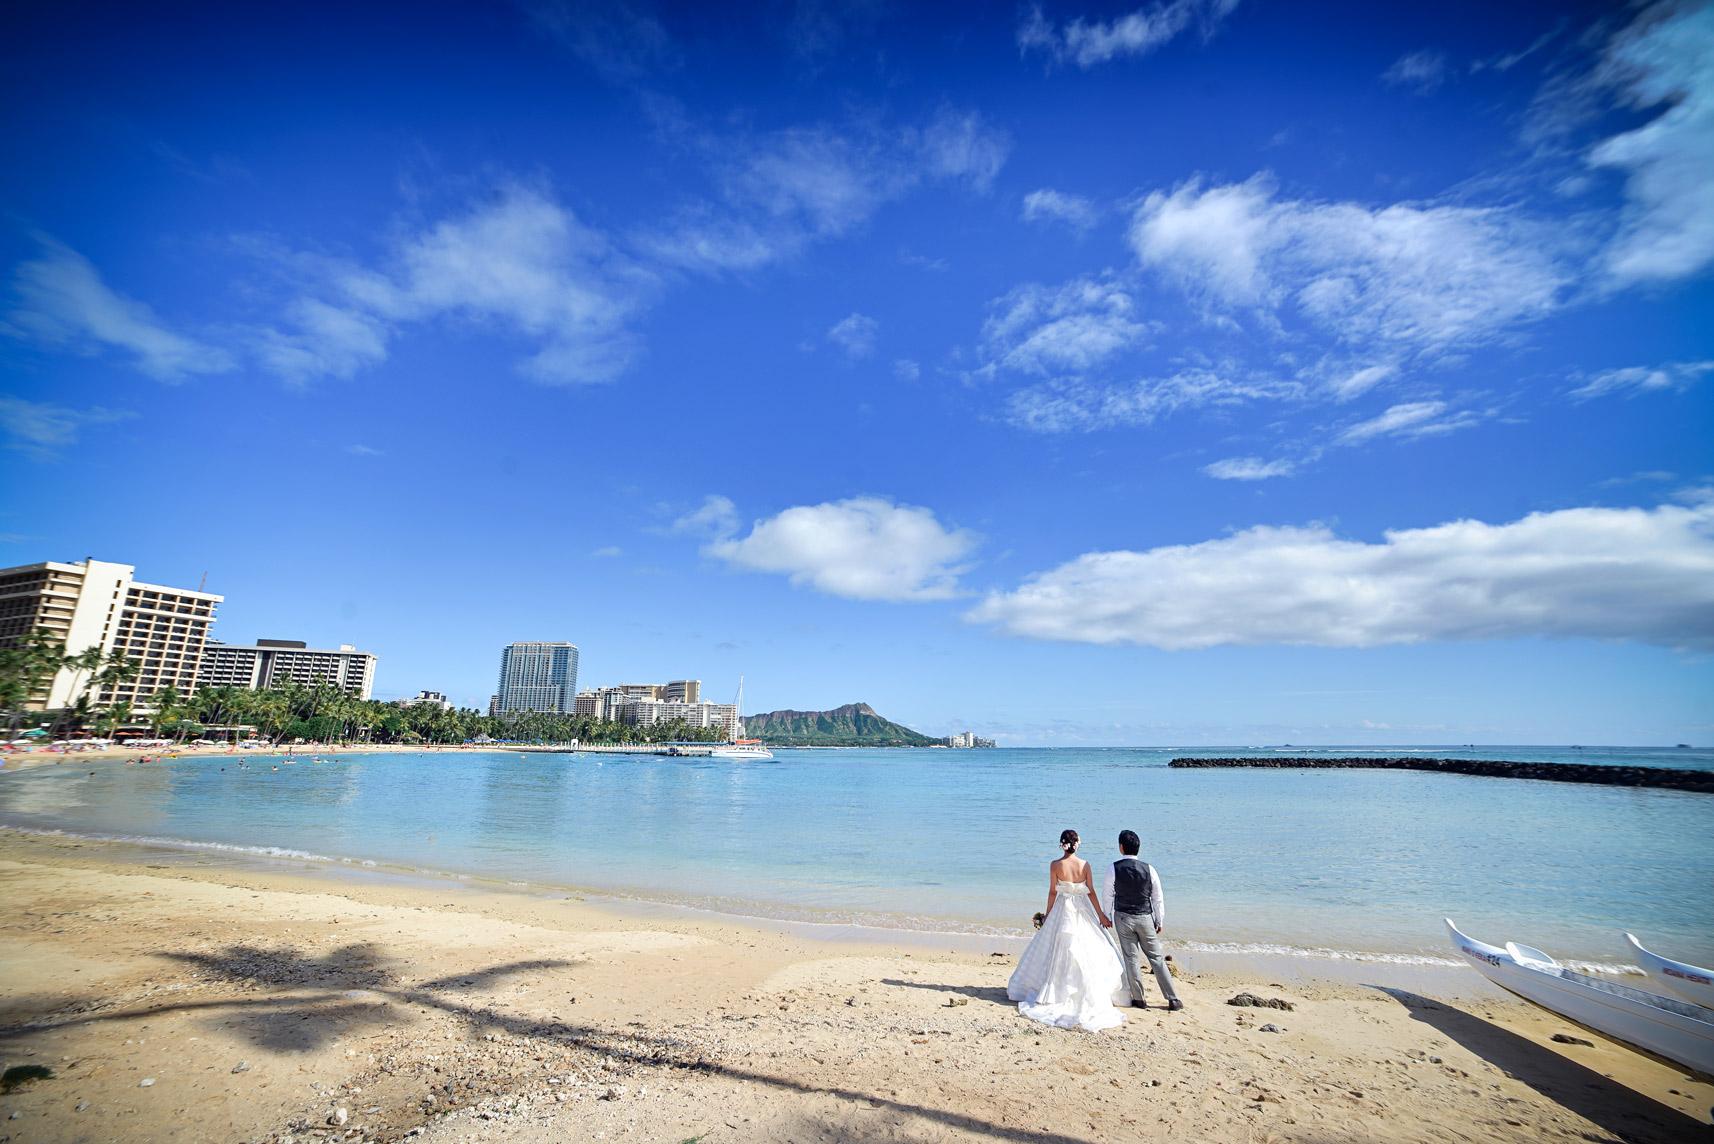 waikiki-beach-wedding-and-downtown-honolulu-hawaii-theater-stephen-ludwig-photography184.jpg